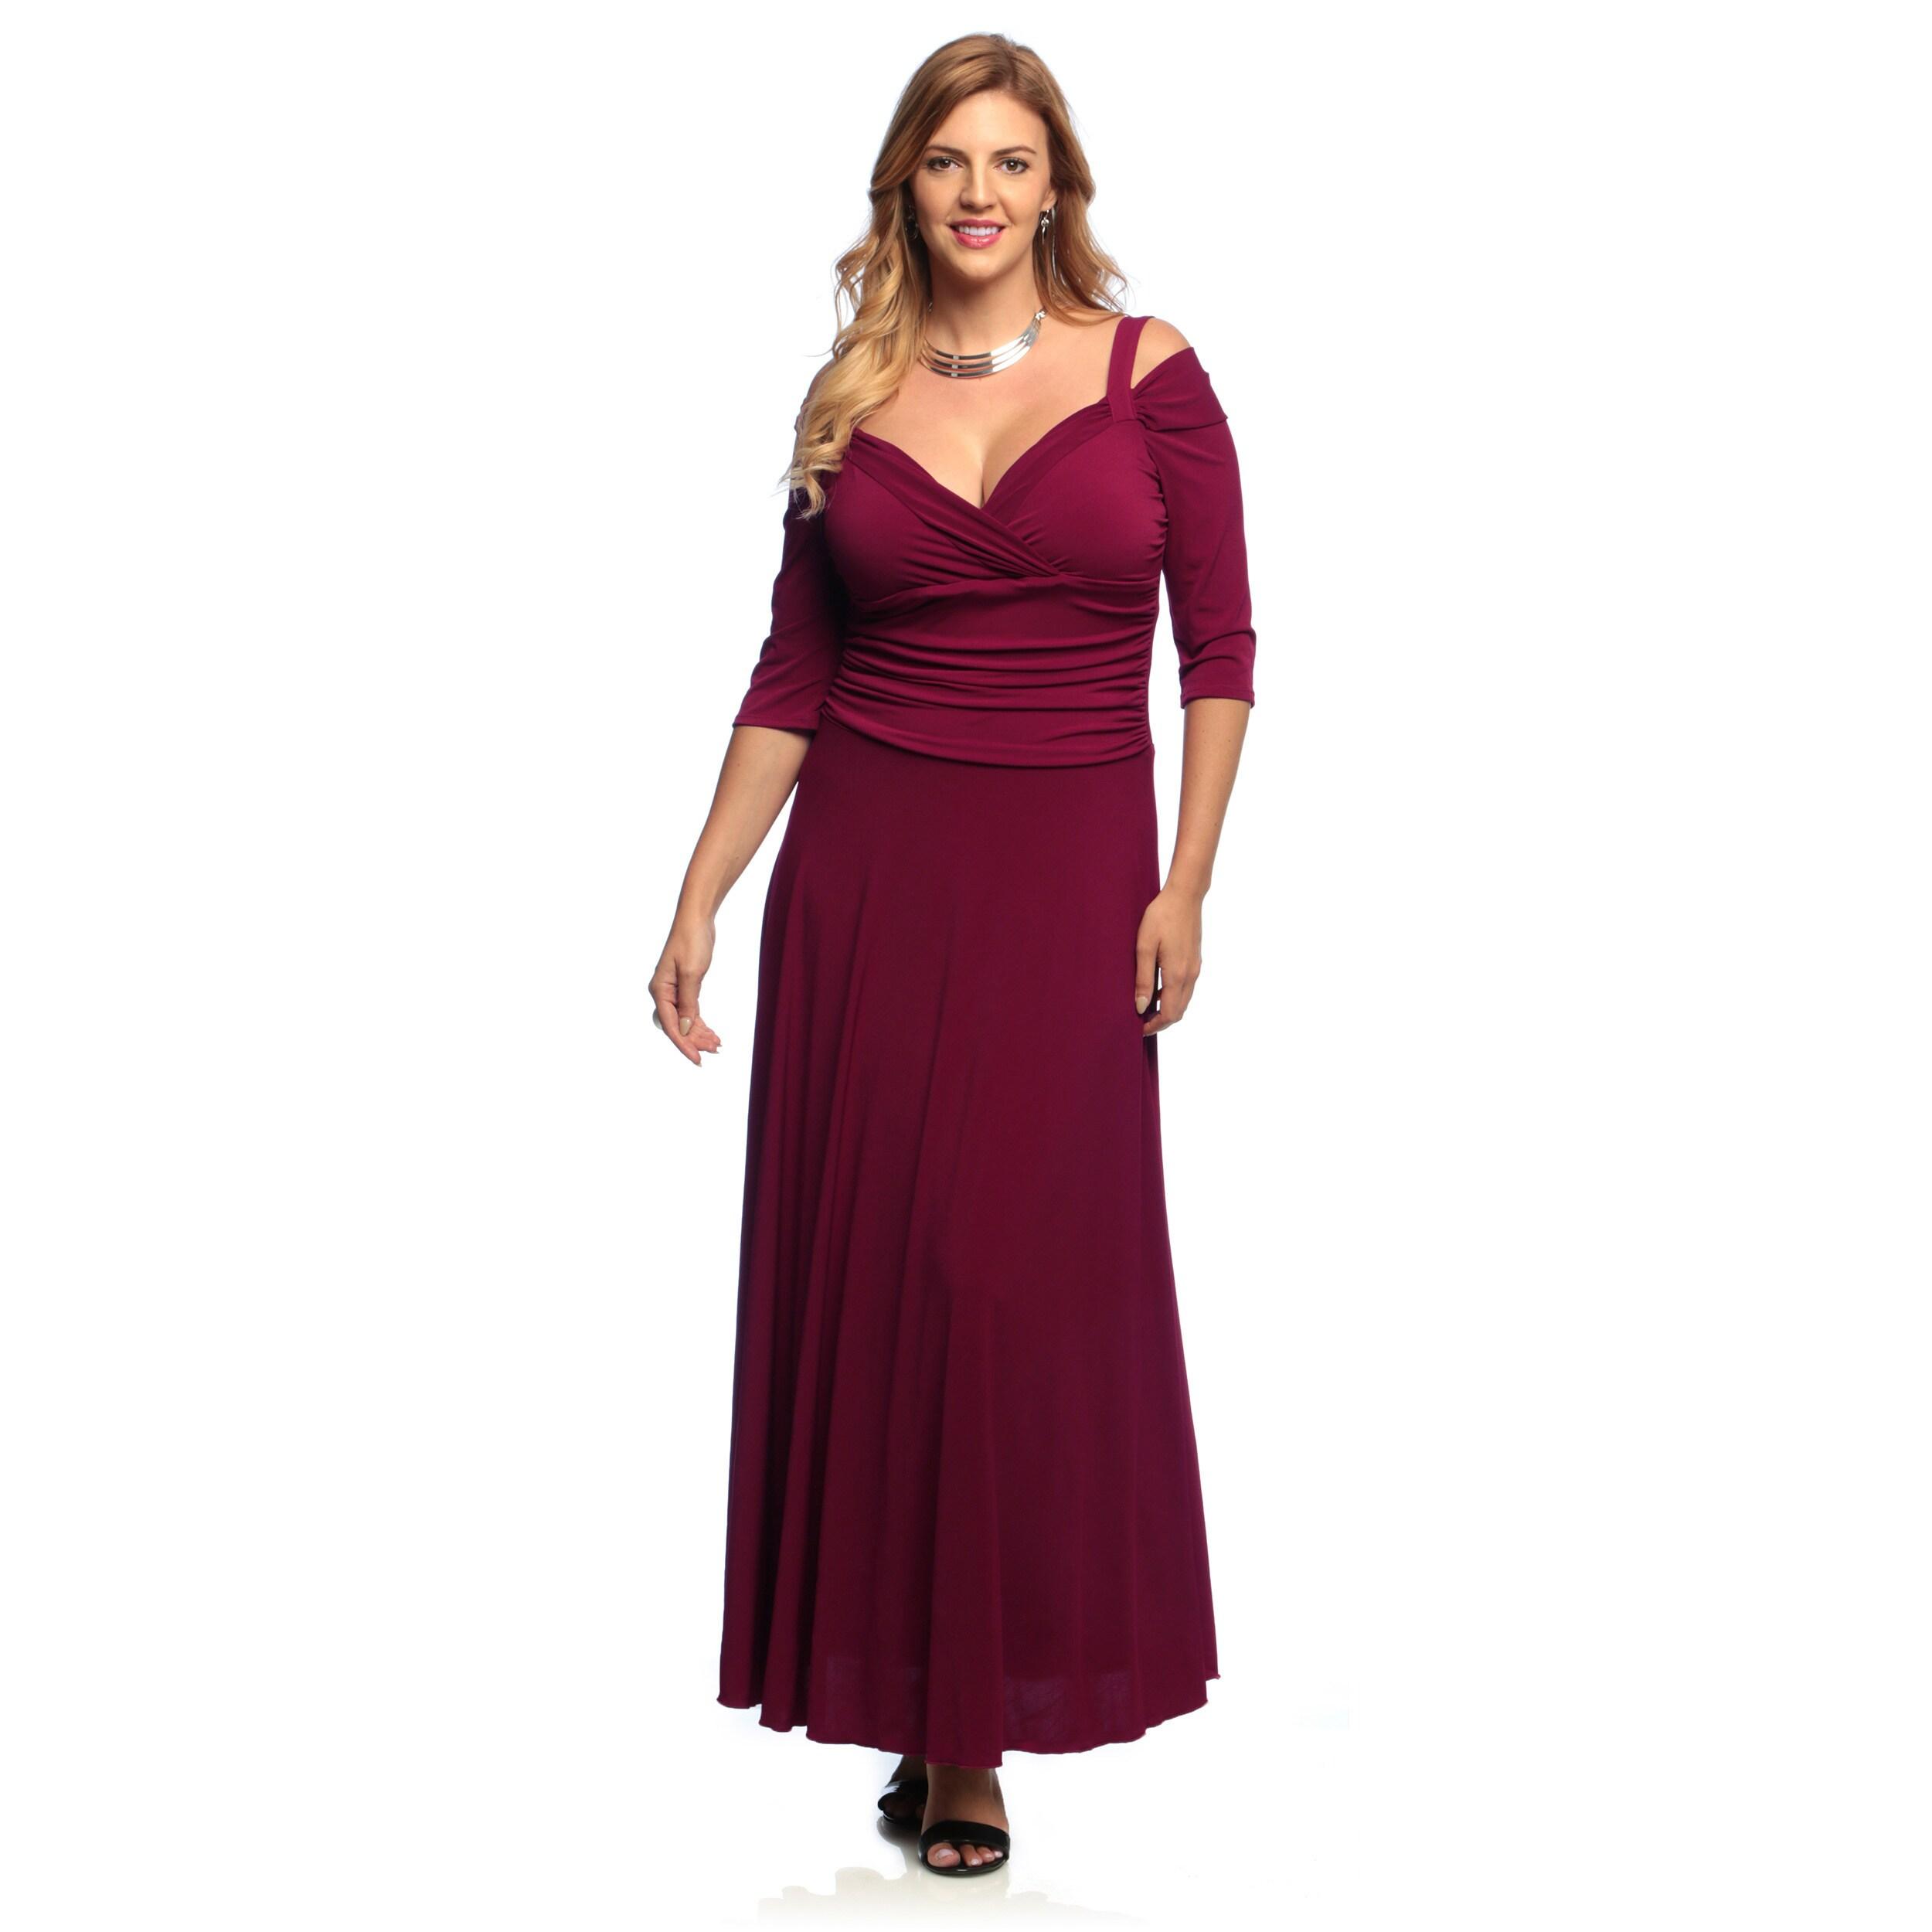 Shop Evanese Women\'s Plus Size 3/4-sleeve Long Dress - Free Shipping ...